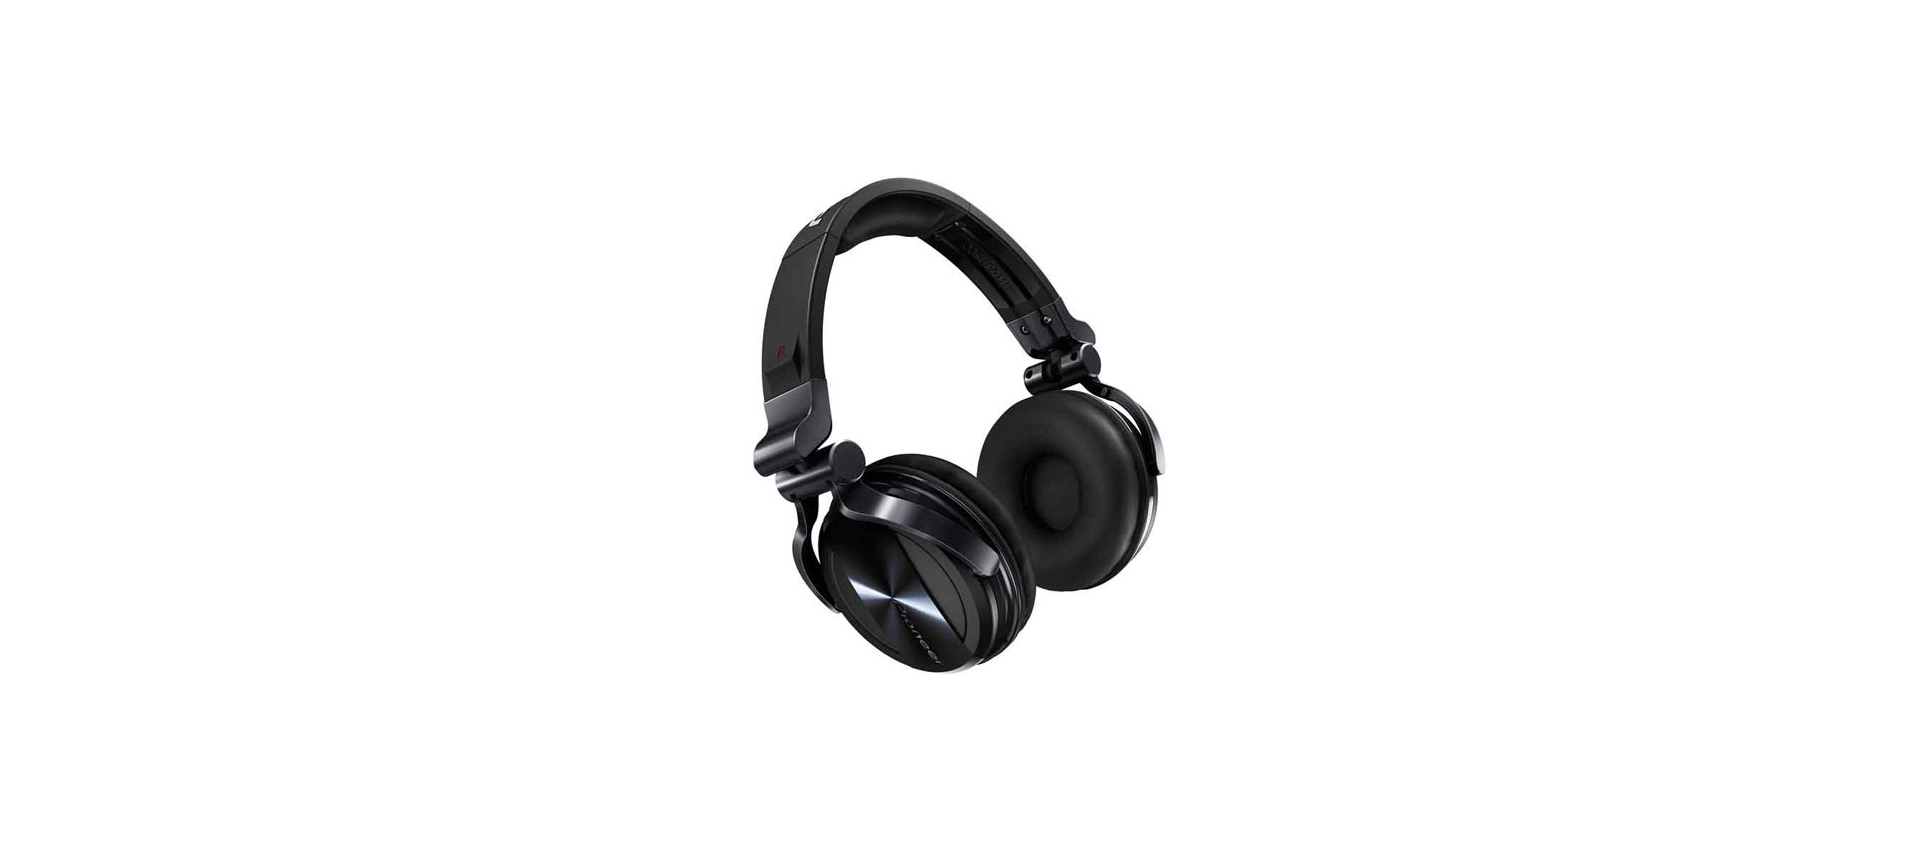 Pioneer hdj-1500-k black dj cuffia  Cuffie DJ a40e22657a62